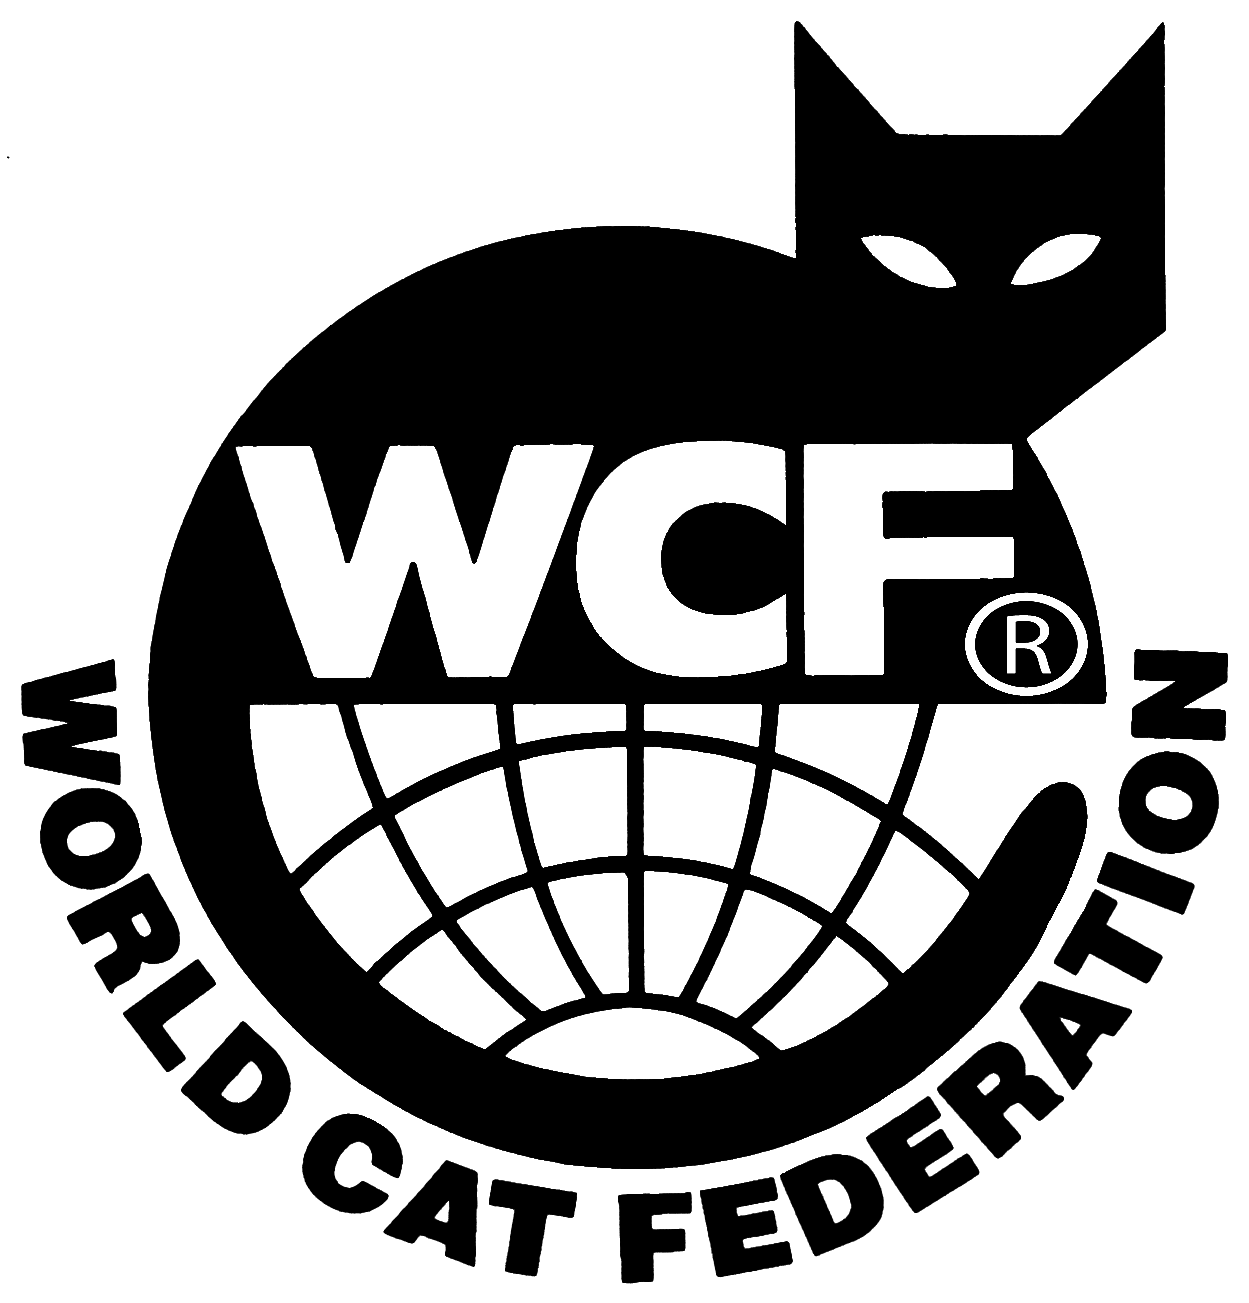 3 DAYS WCF CAT INTERNATIONAL SHOW ATHENS.